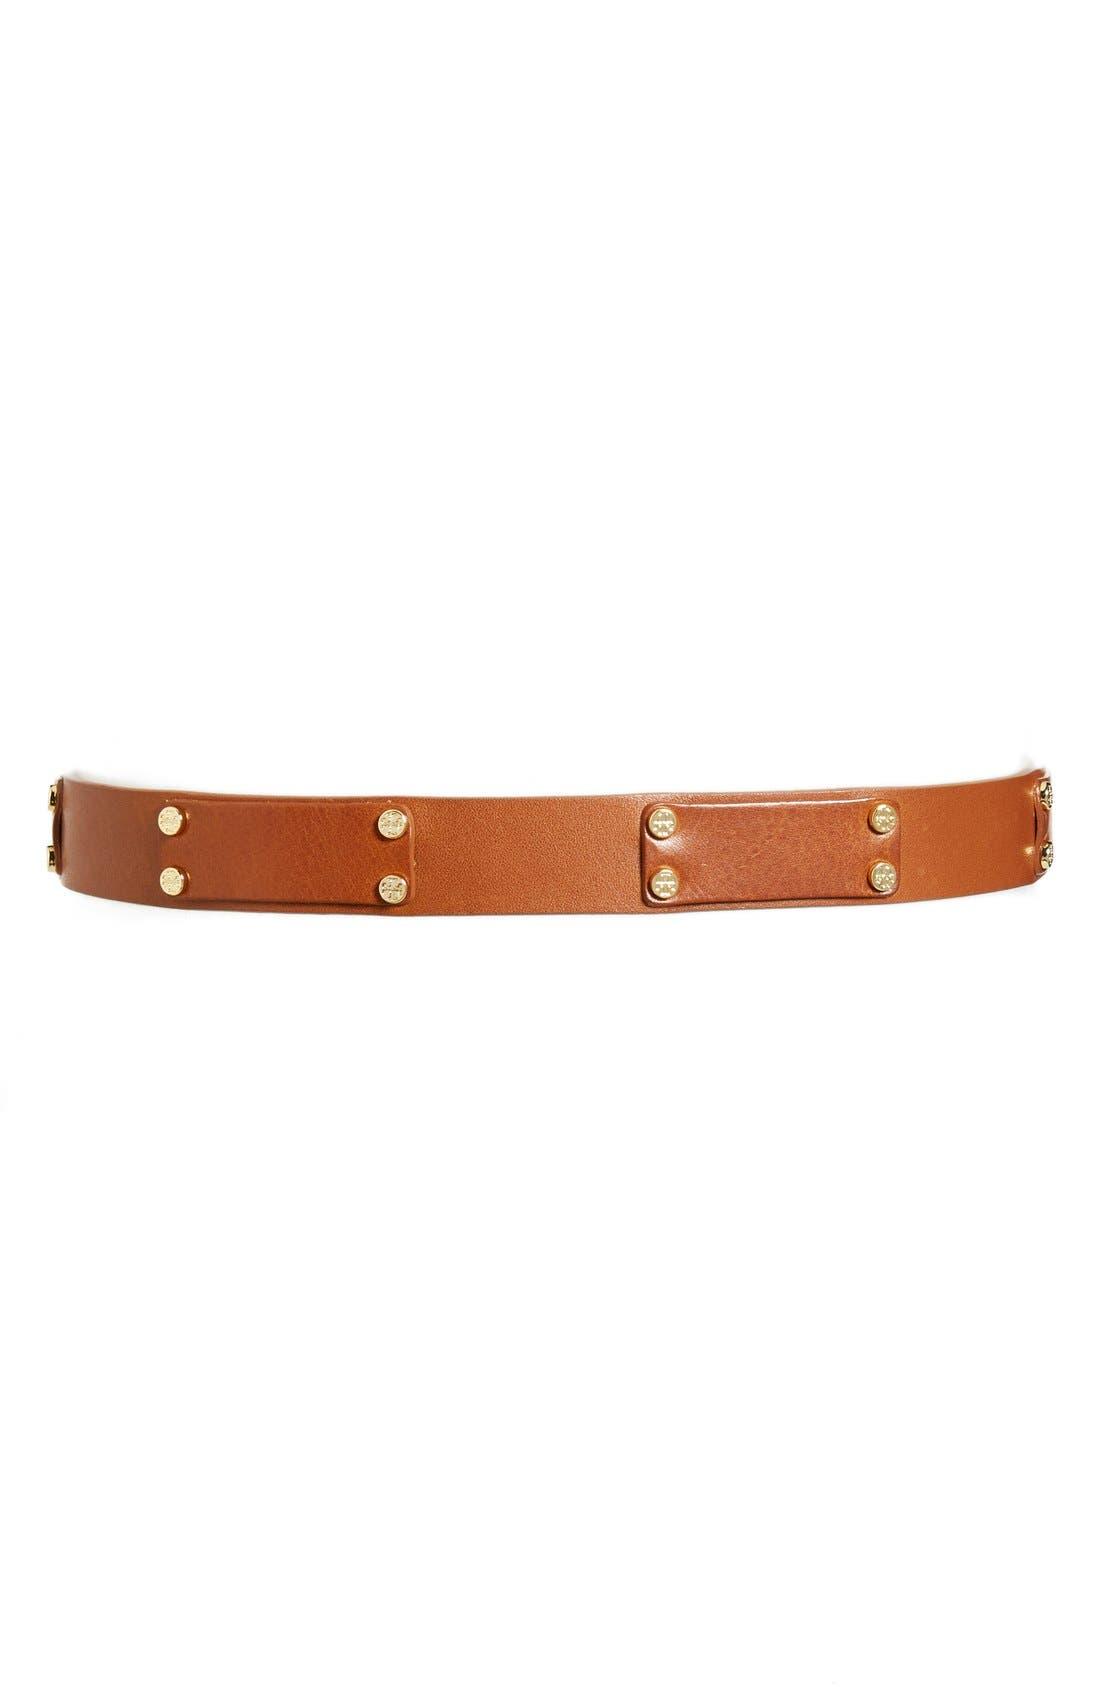 Alternate Image 2  - Tory Burch Leather Rivet Belt